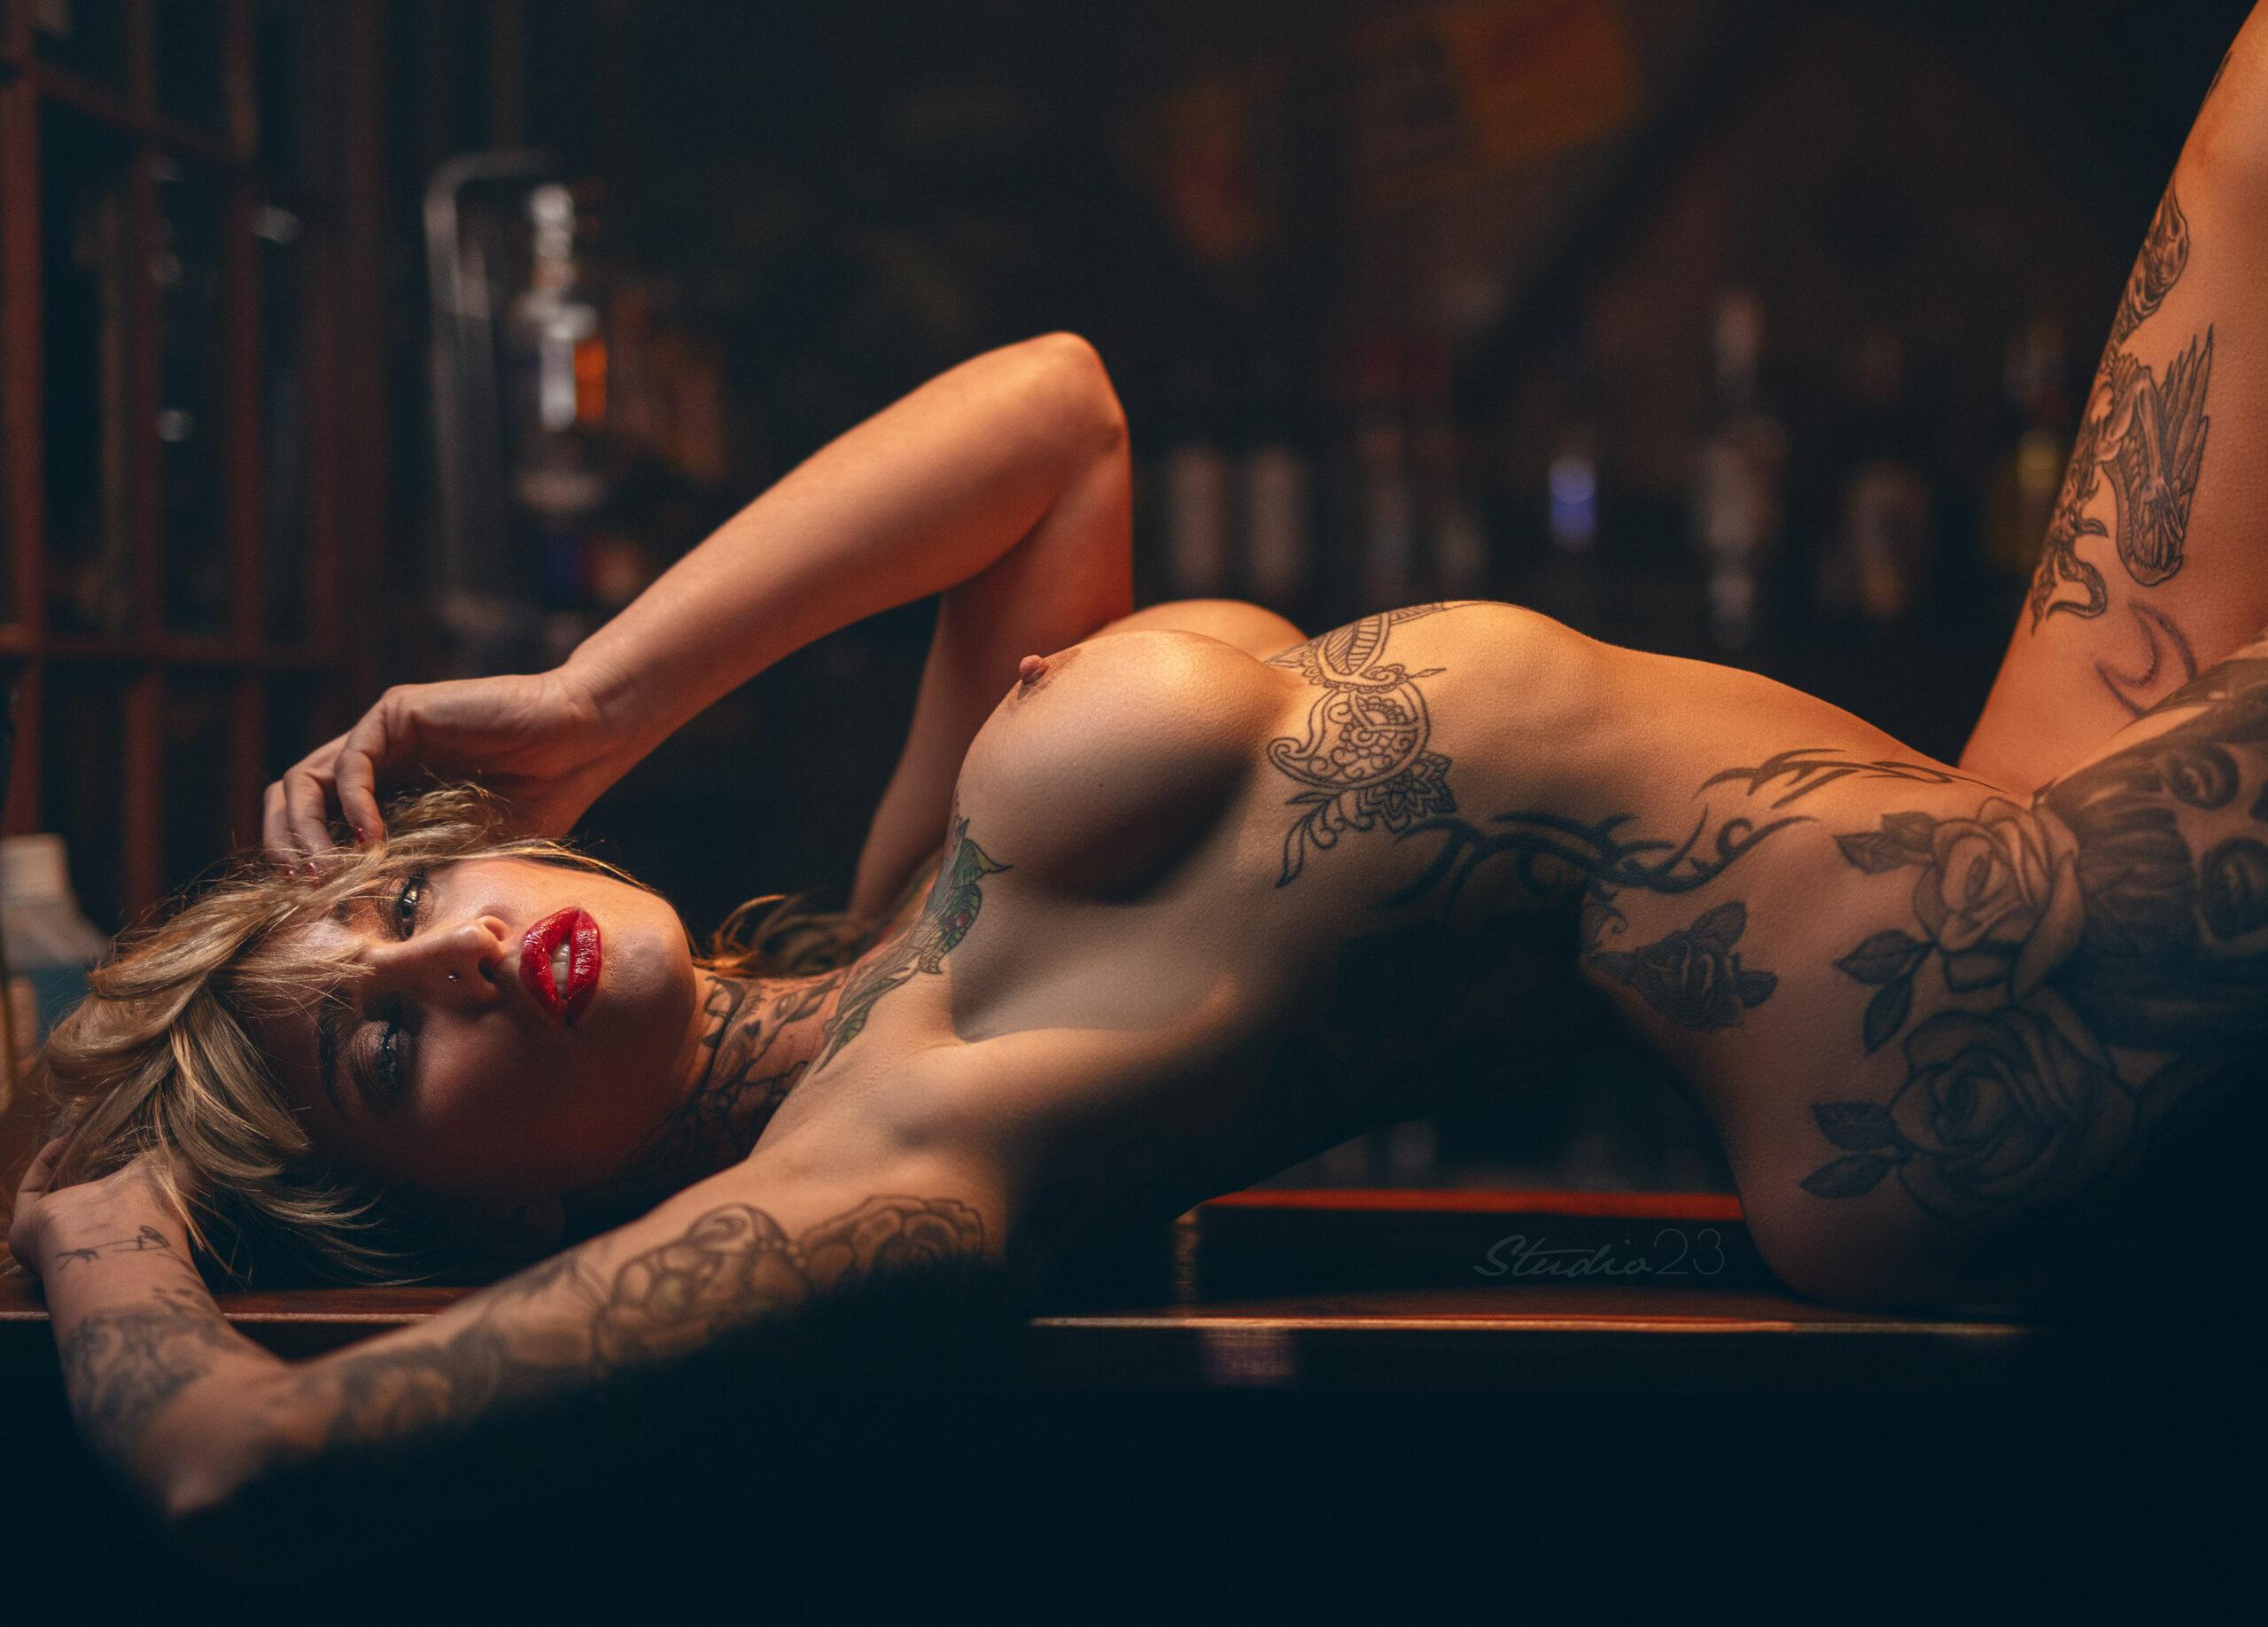 Tattooed gf porn and nude girlfriend pics